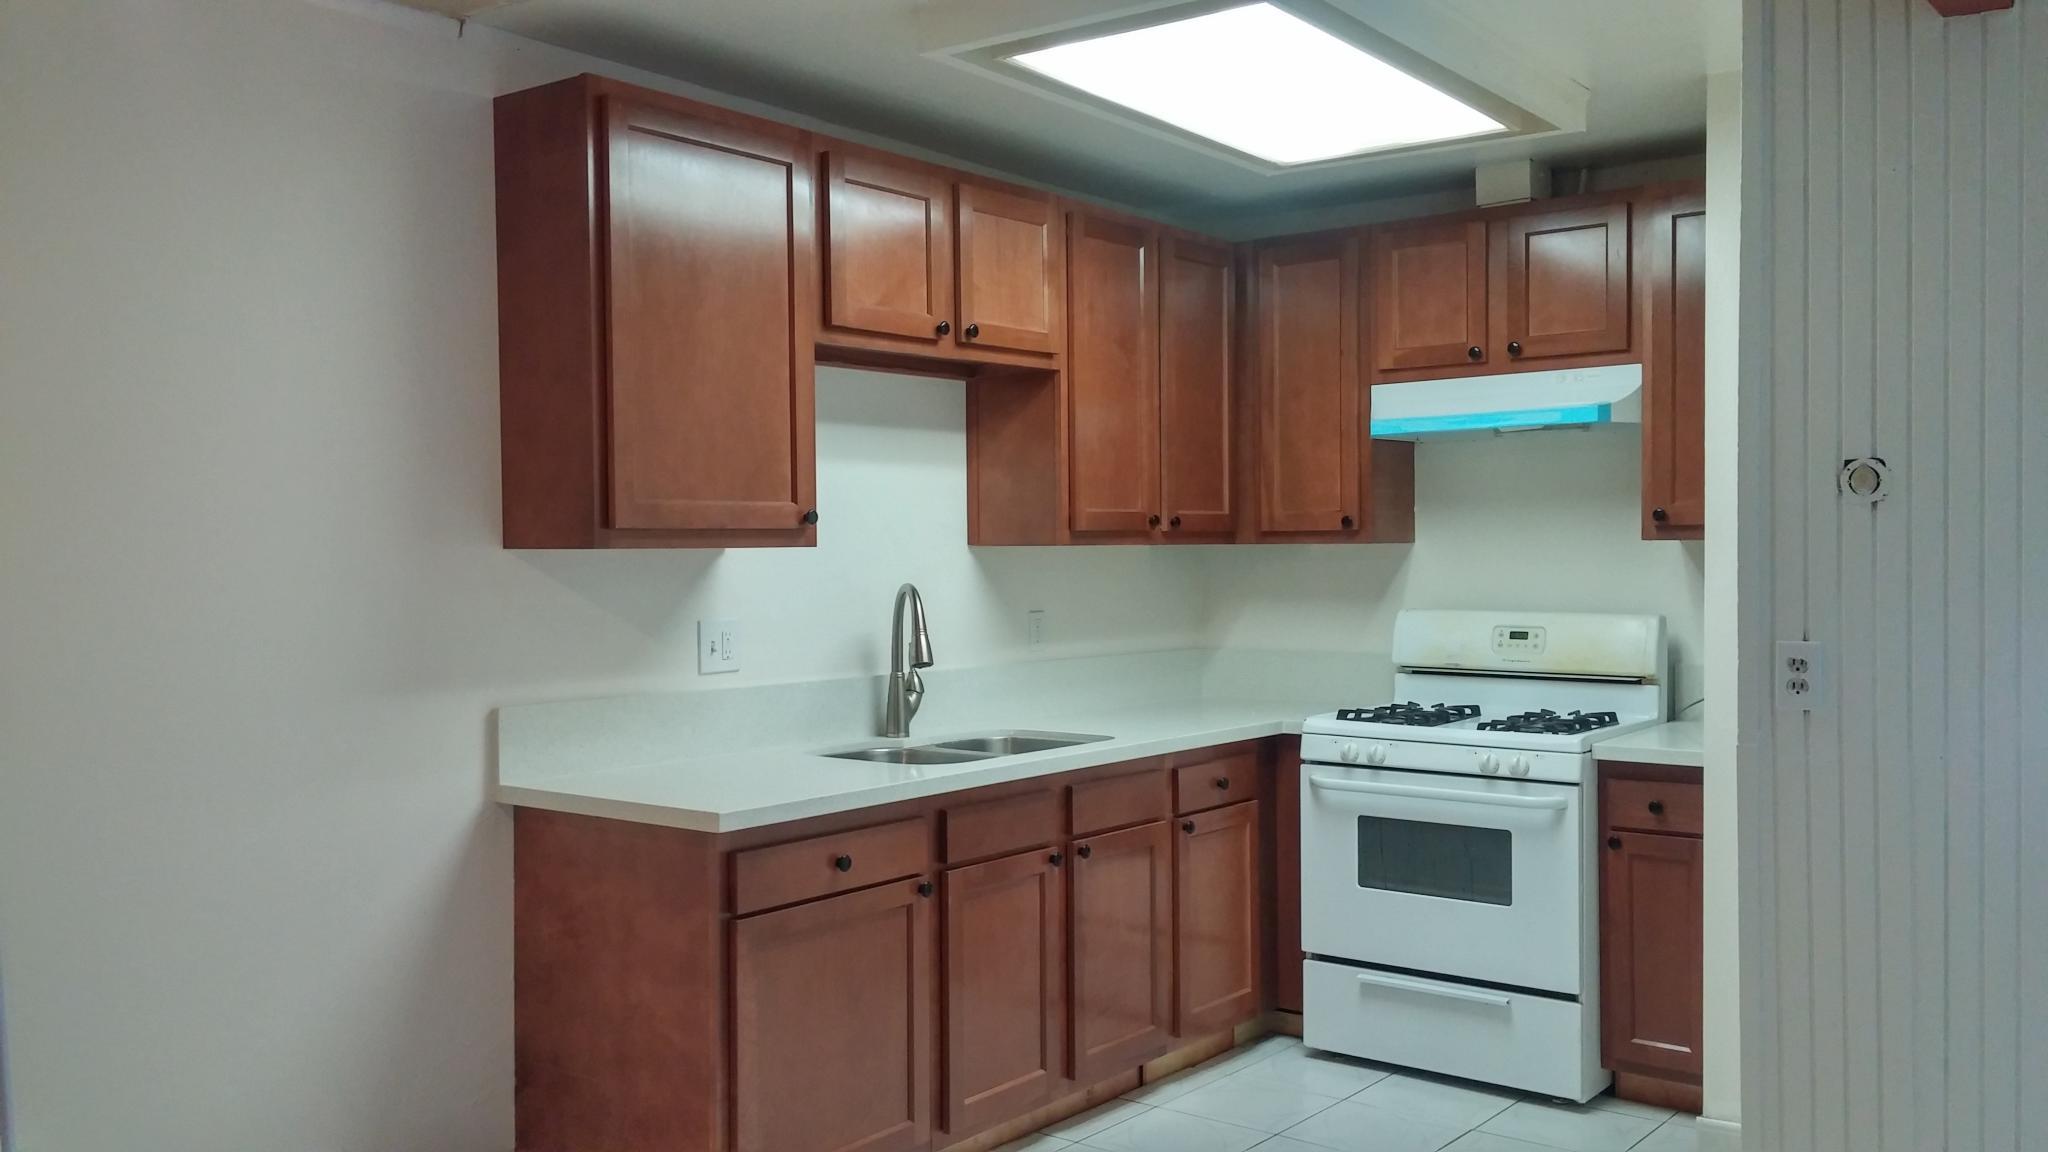 1001 W Macarthur Blvd #79 For Rent - Santa Ana, CA | Trulia